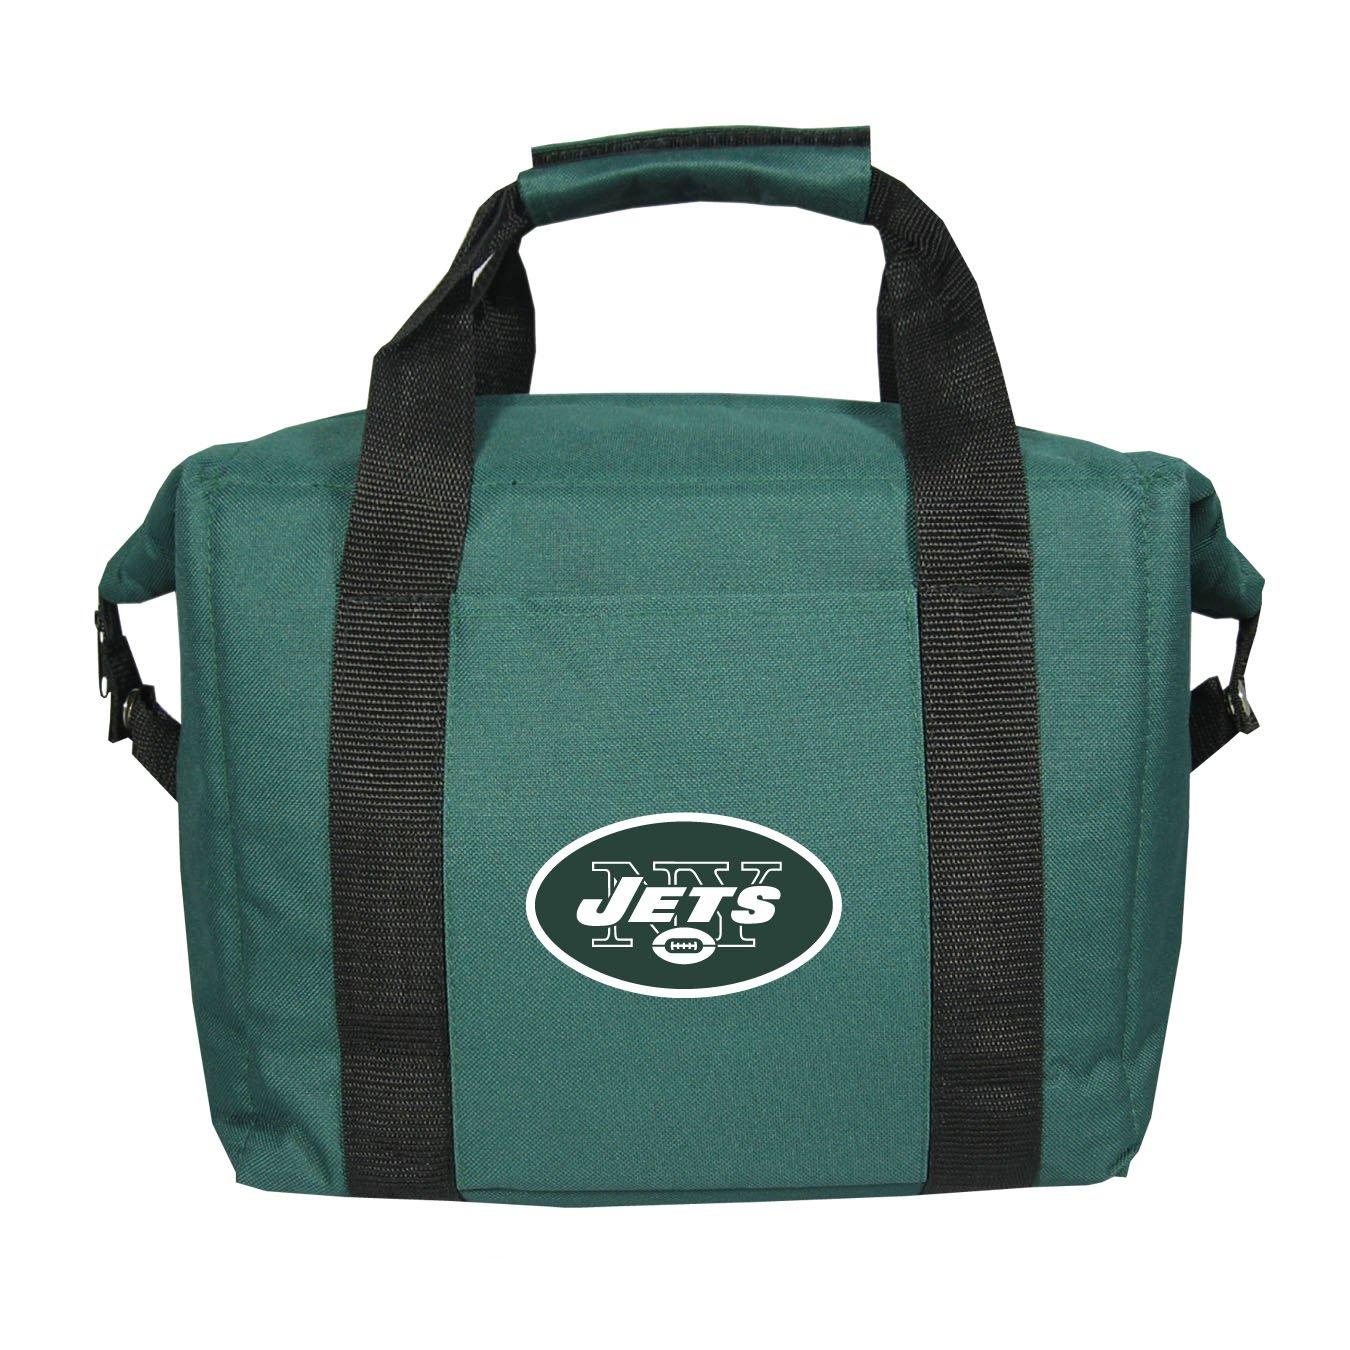 Kolder New York Jets 12 pack Cooler